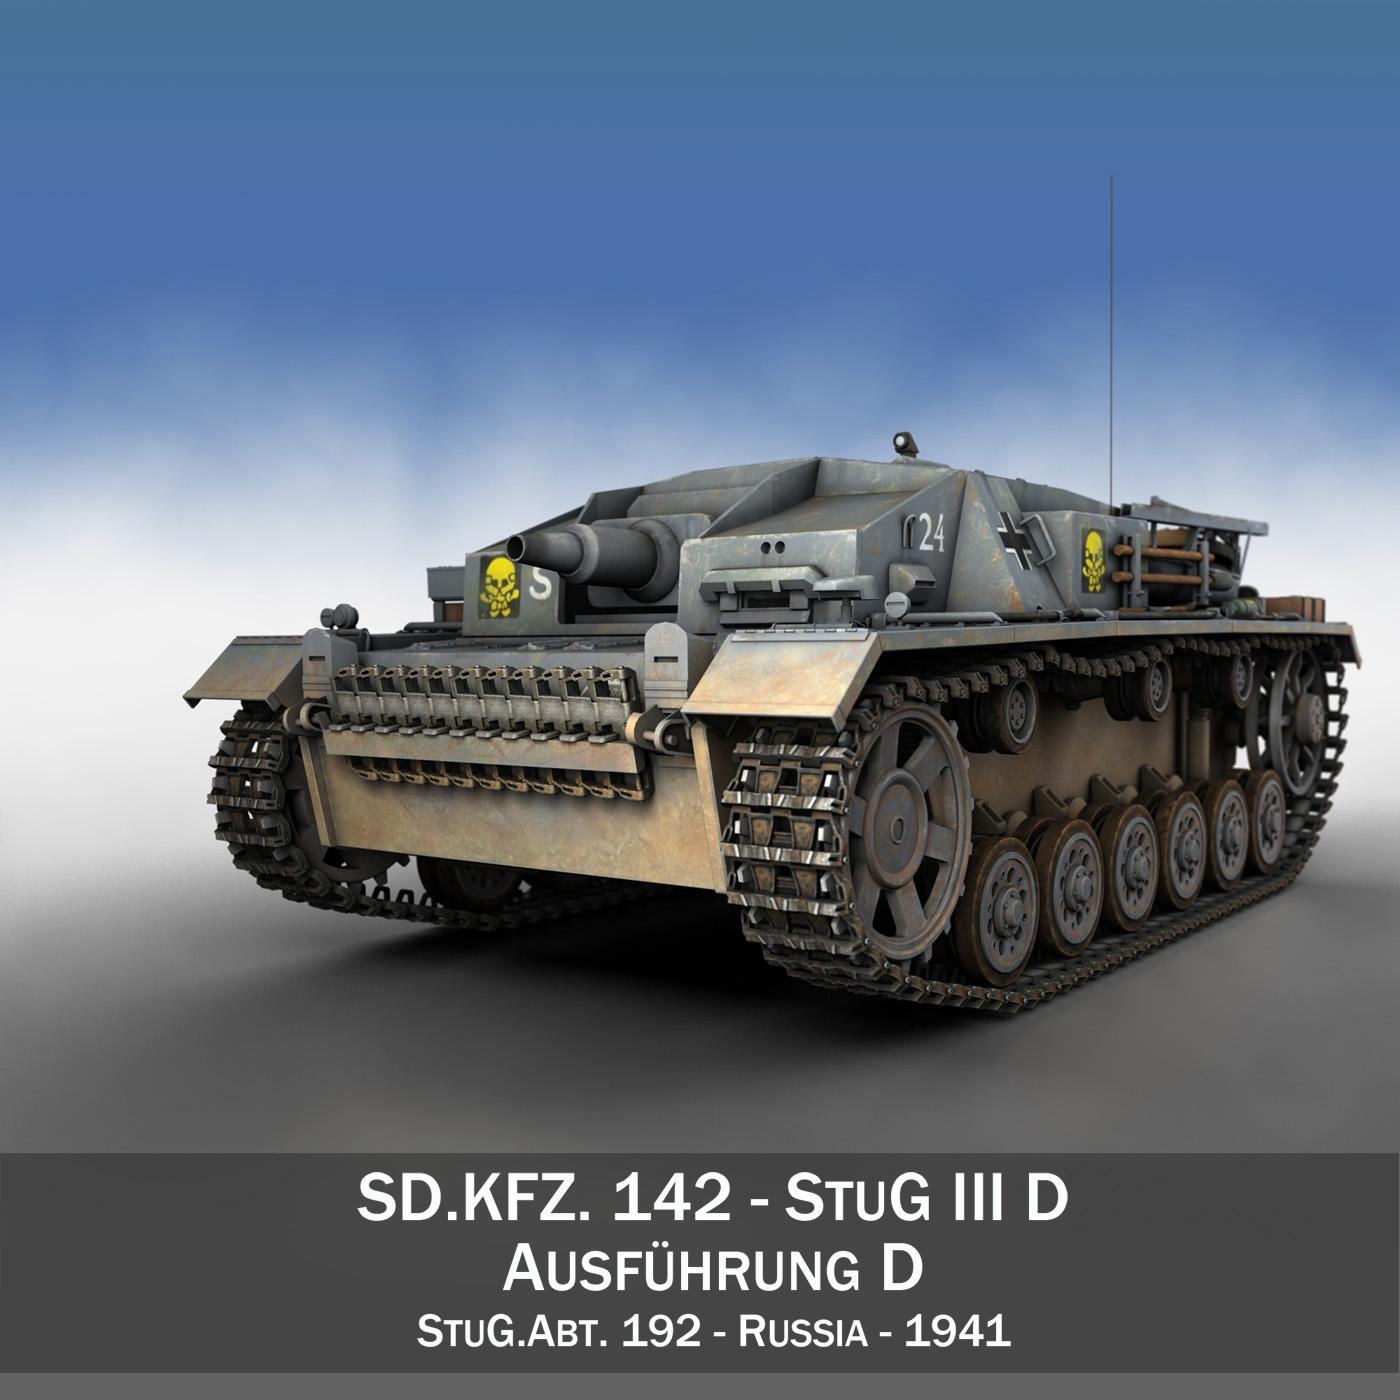 stug iii – ausf.d – stug.abt. 192 3d model 3ds fbx c4d lwo obj 197018